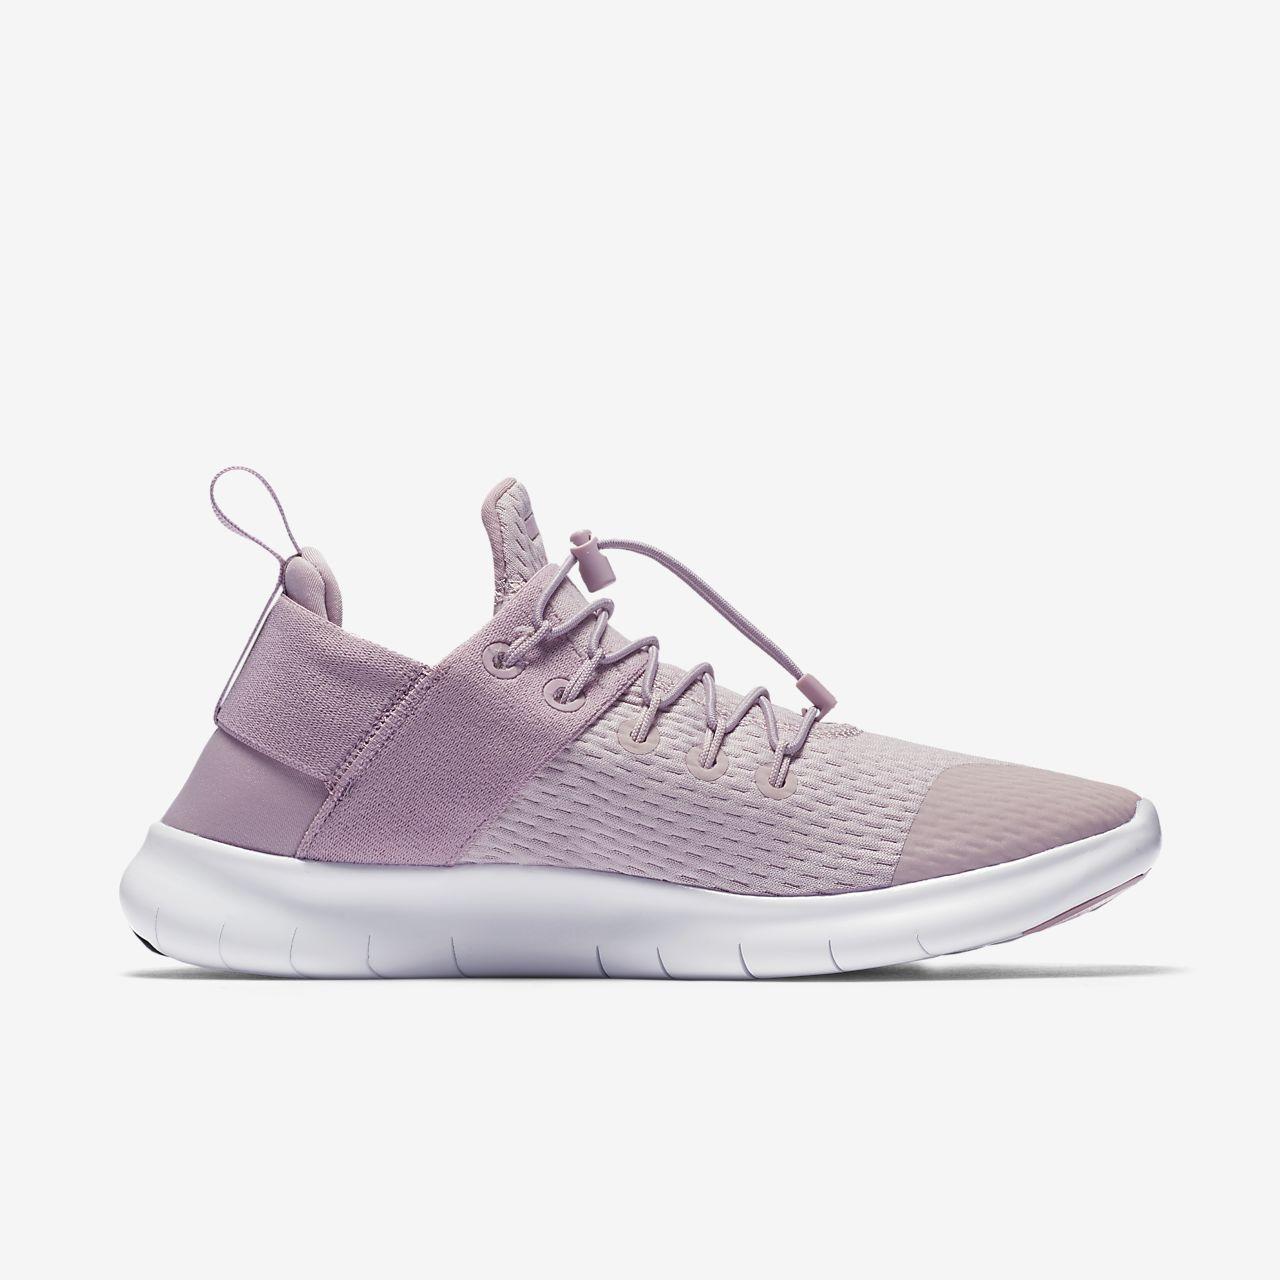 Nike Free Run Banlieue 2017 Hardloopschoen fjo0e6Qsz